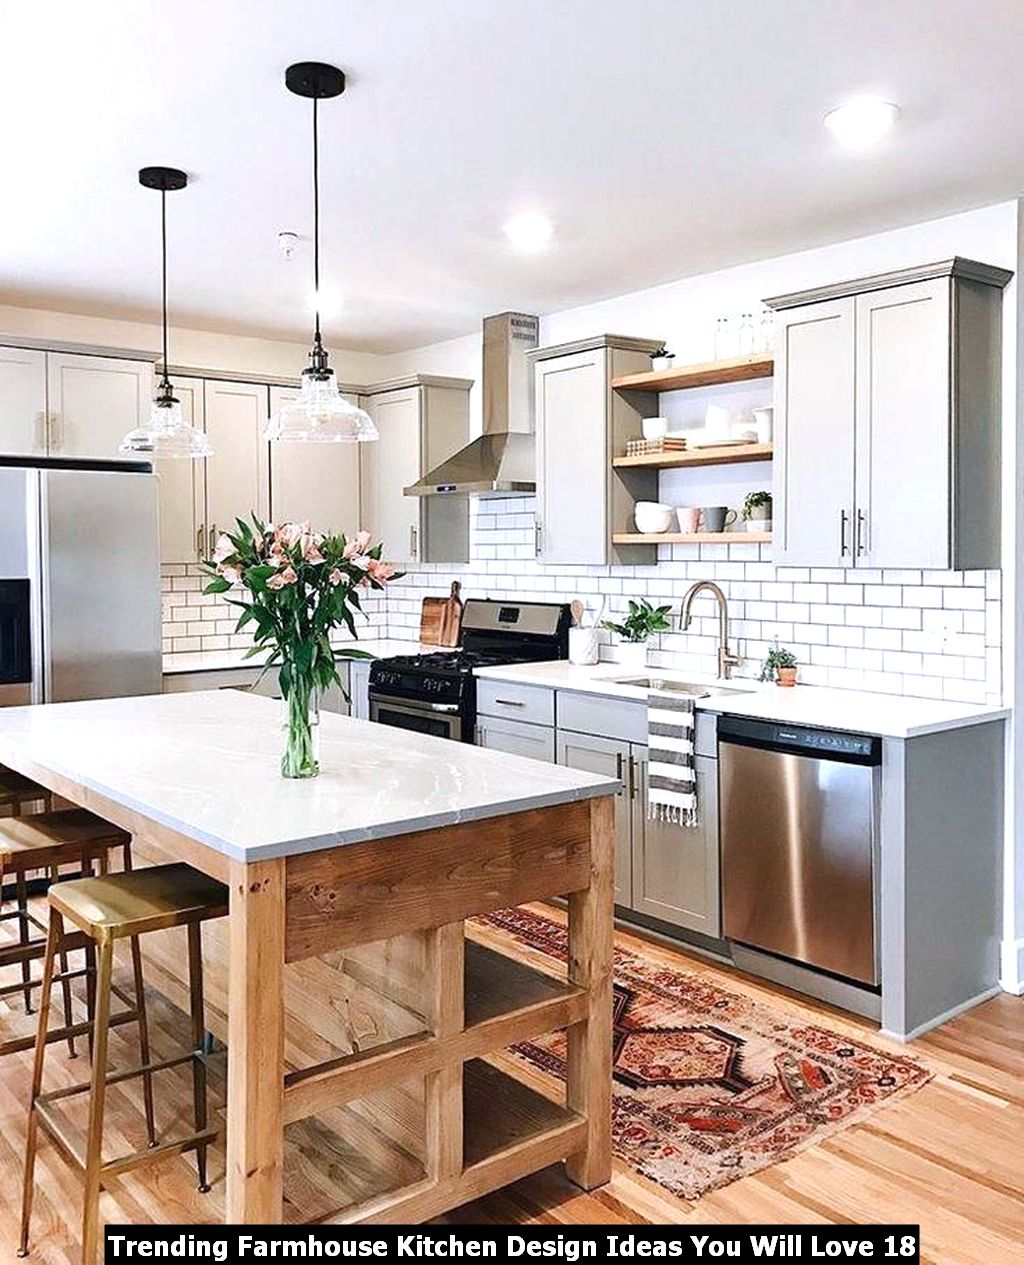 Trending Farmhouse Kitchen Design Ideas You Will Love 18